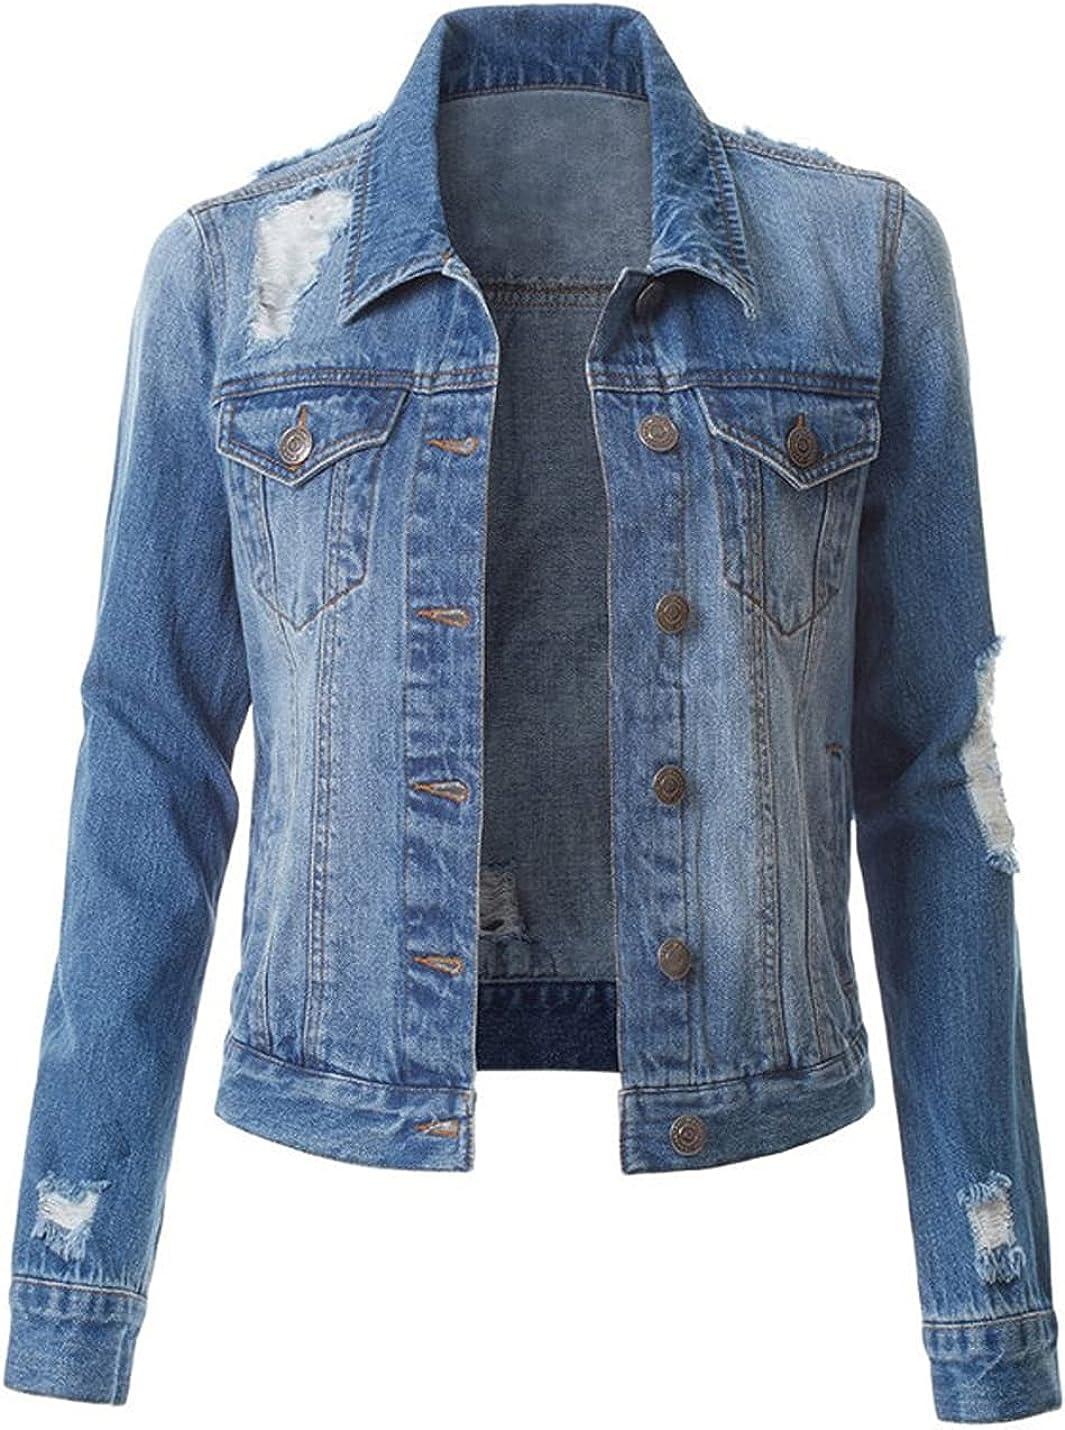 Bankeng Women's Classic Slim Fit Ripped Casual Denim Jacket